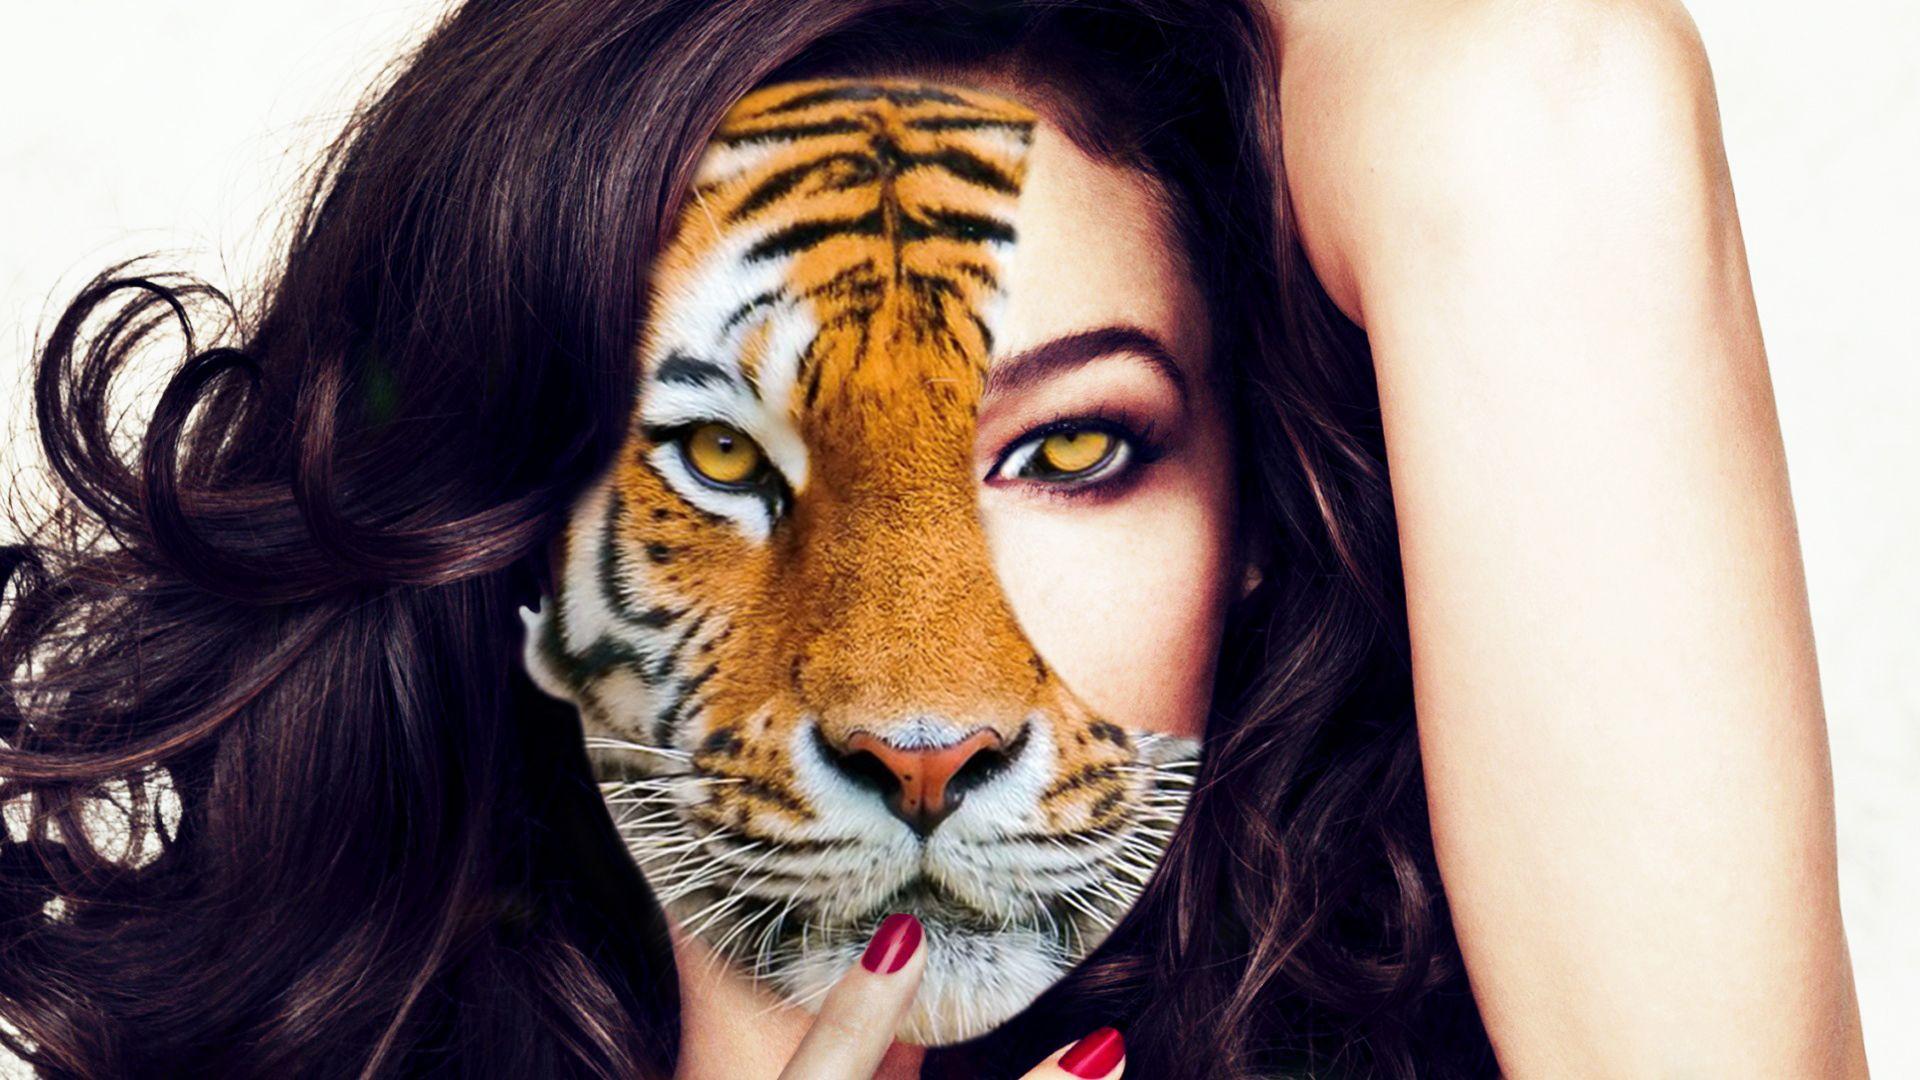 Half Animal Half Human Special Effect Monicabellucci